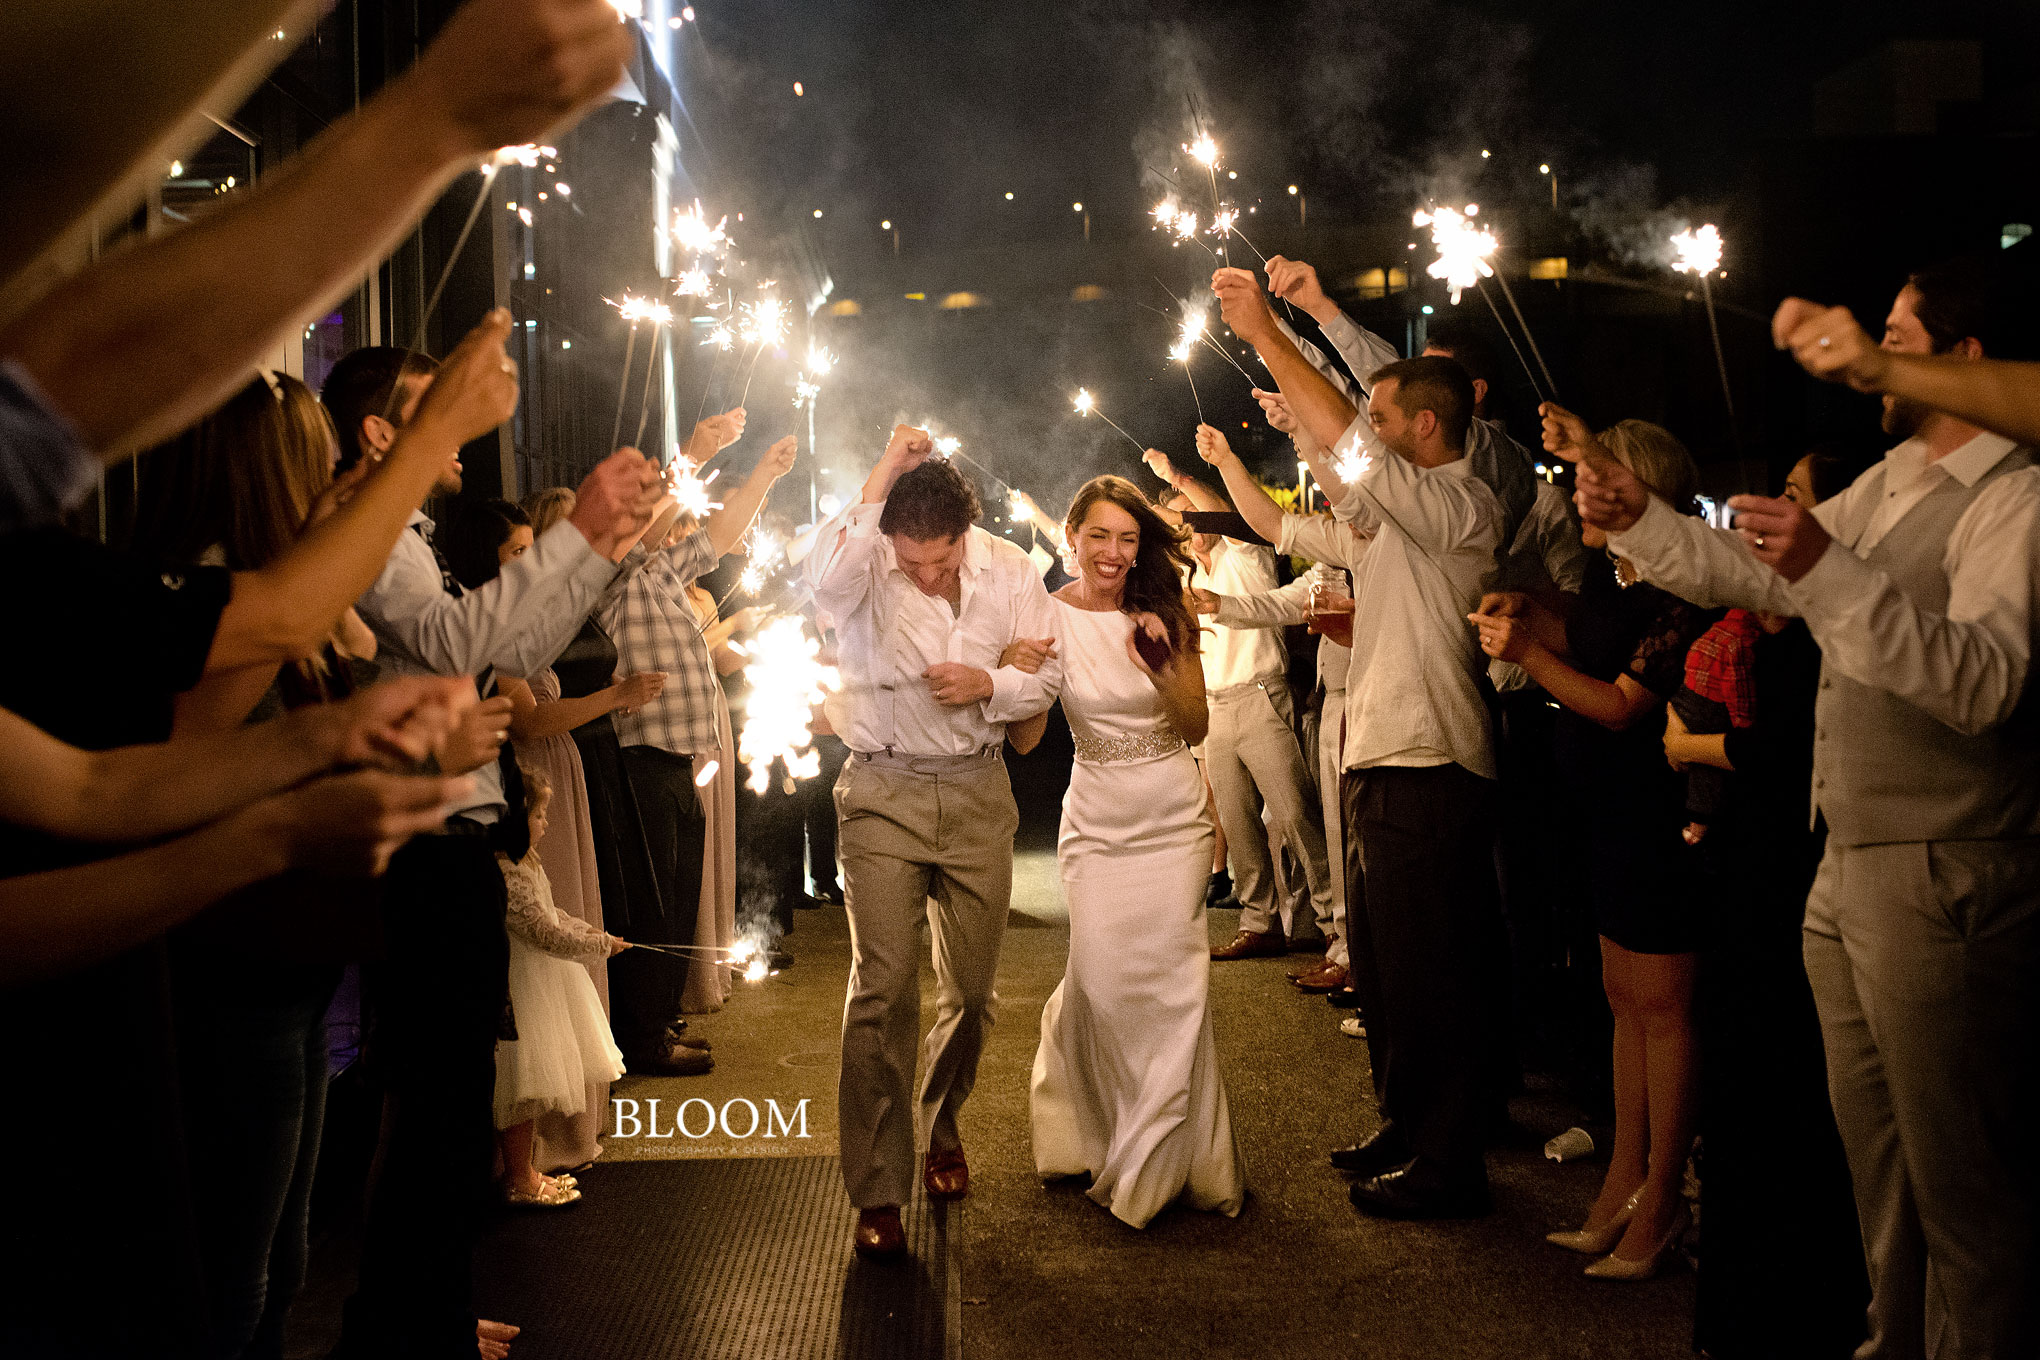 portland_oregon_wedding_photographer_san_antonio_texas_bloom_231016_NMM_7826.jpg